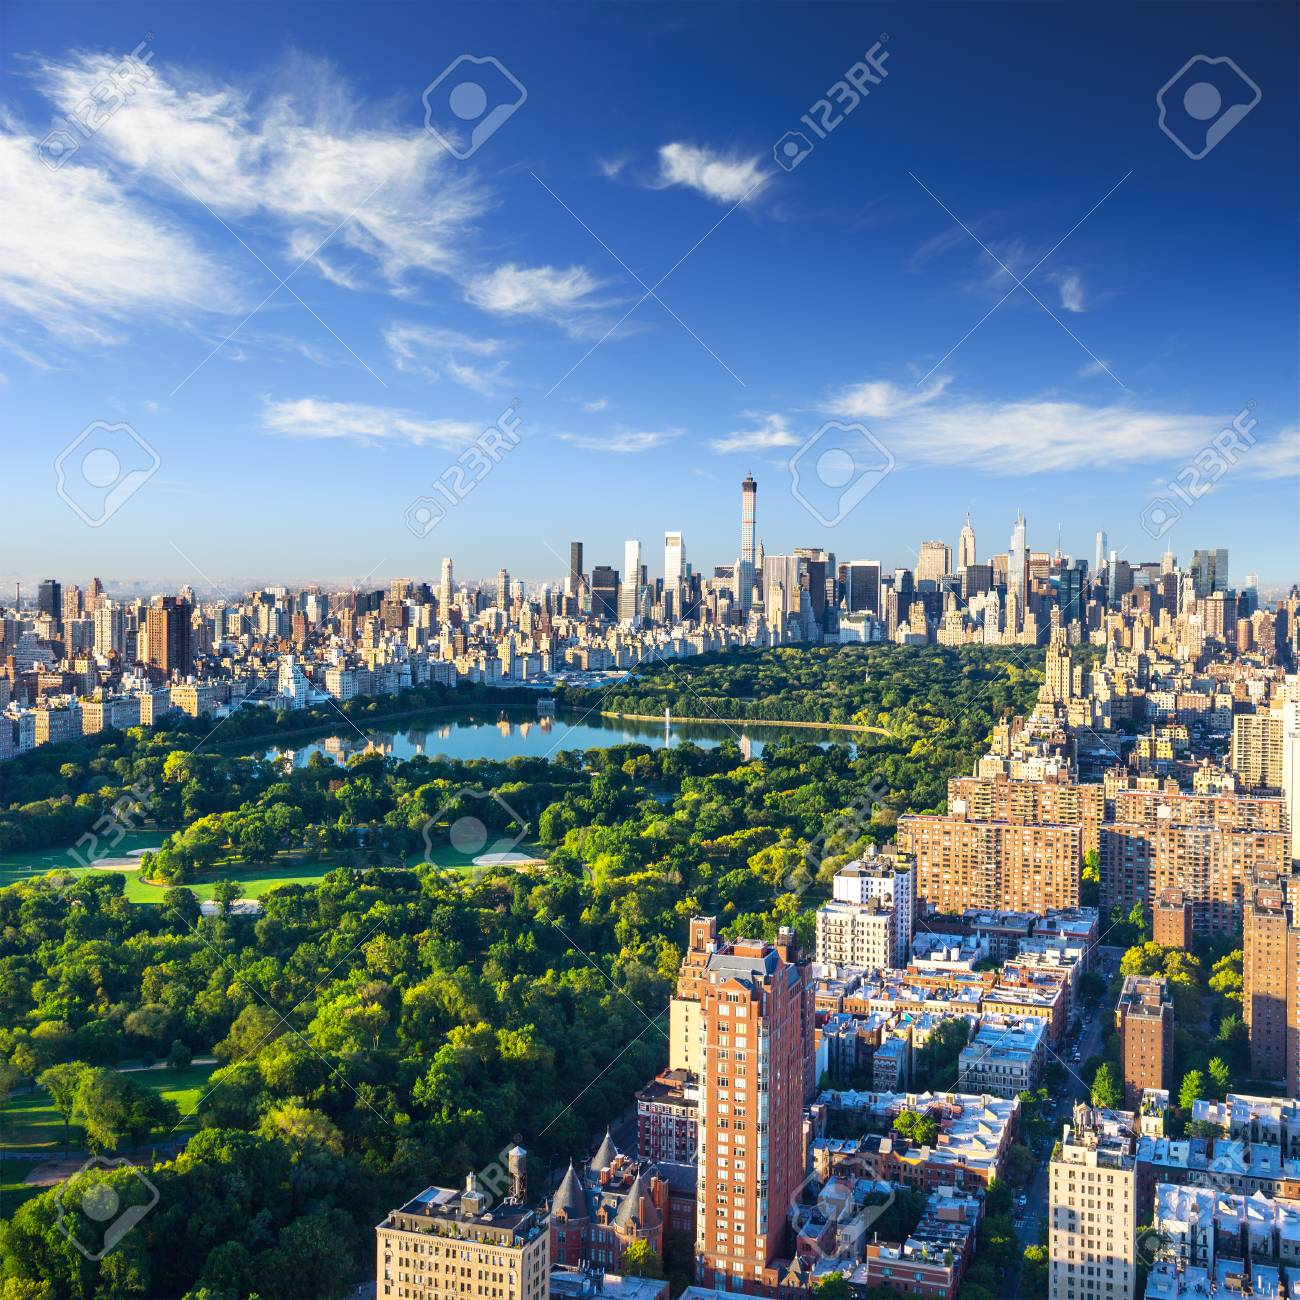 Central Park aerial view, Manhattan, New York - 100284867